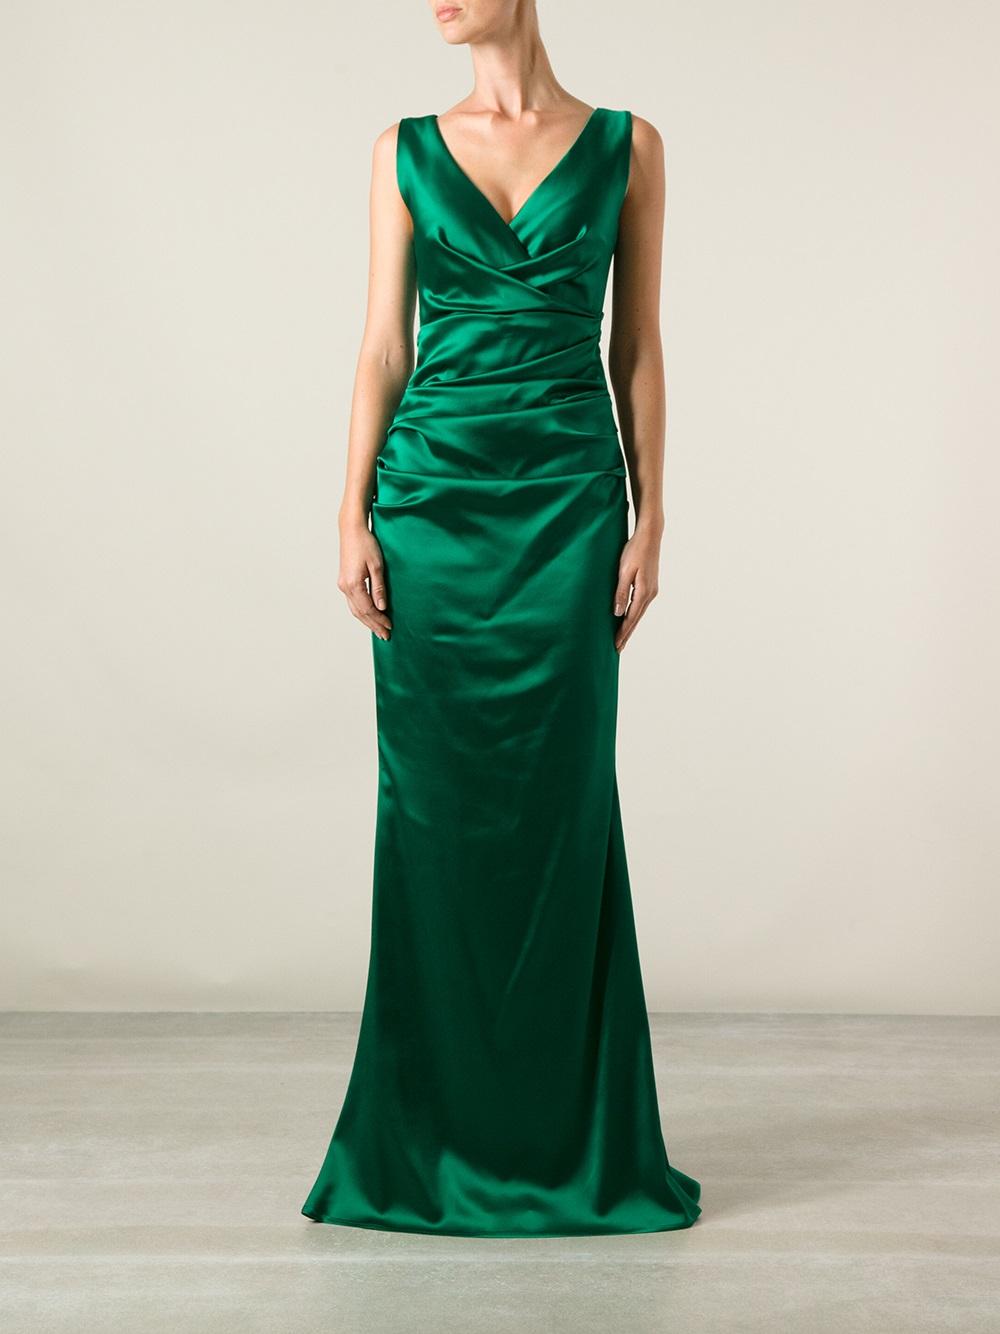 DRESSES - Long dresses Talbot Runhof IqRRsB